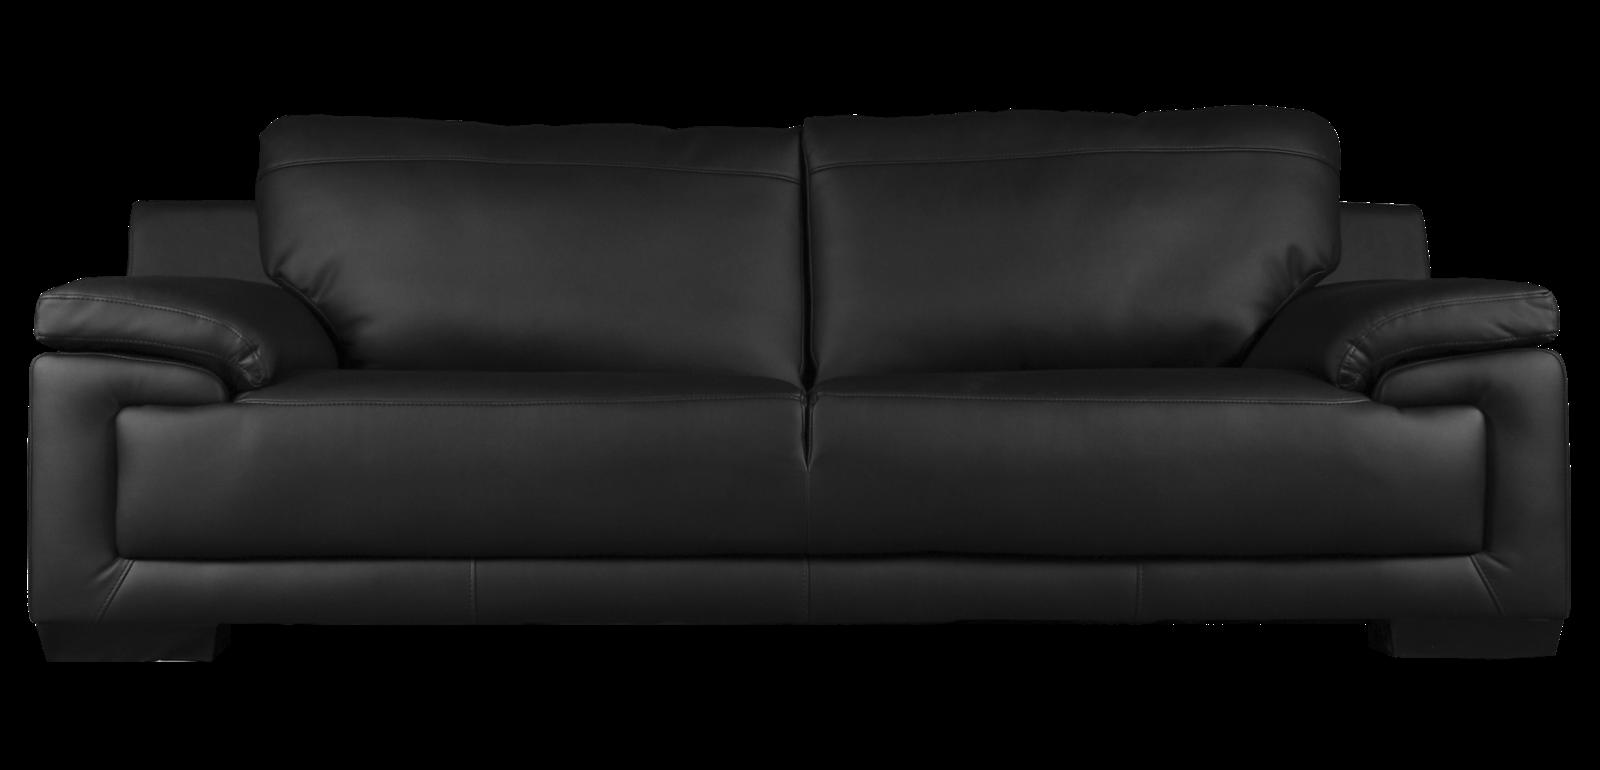 Black sofa PNG image - Sofa HD PNG